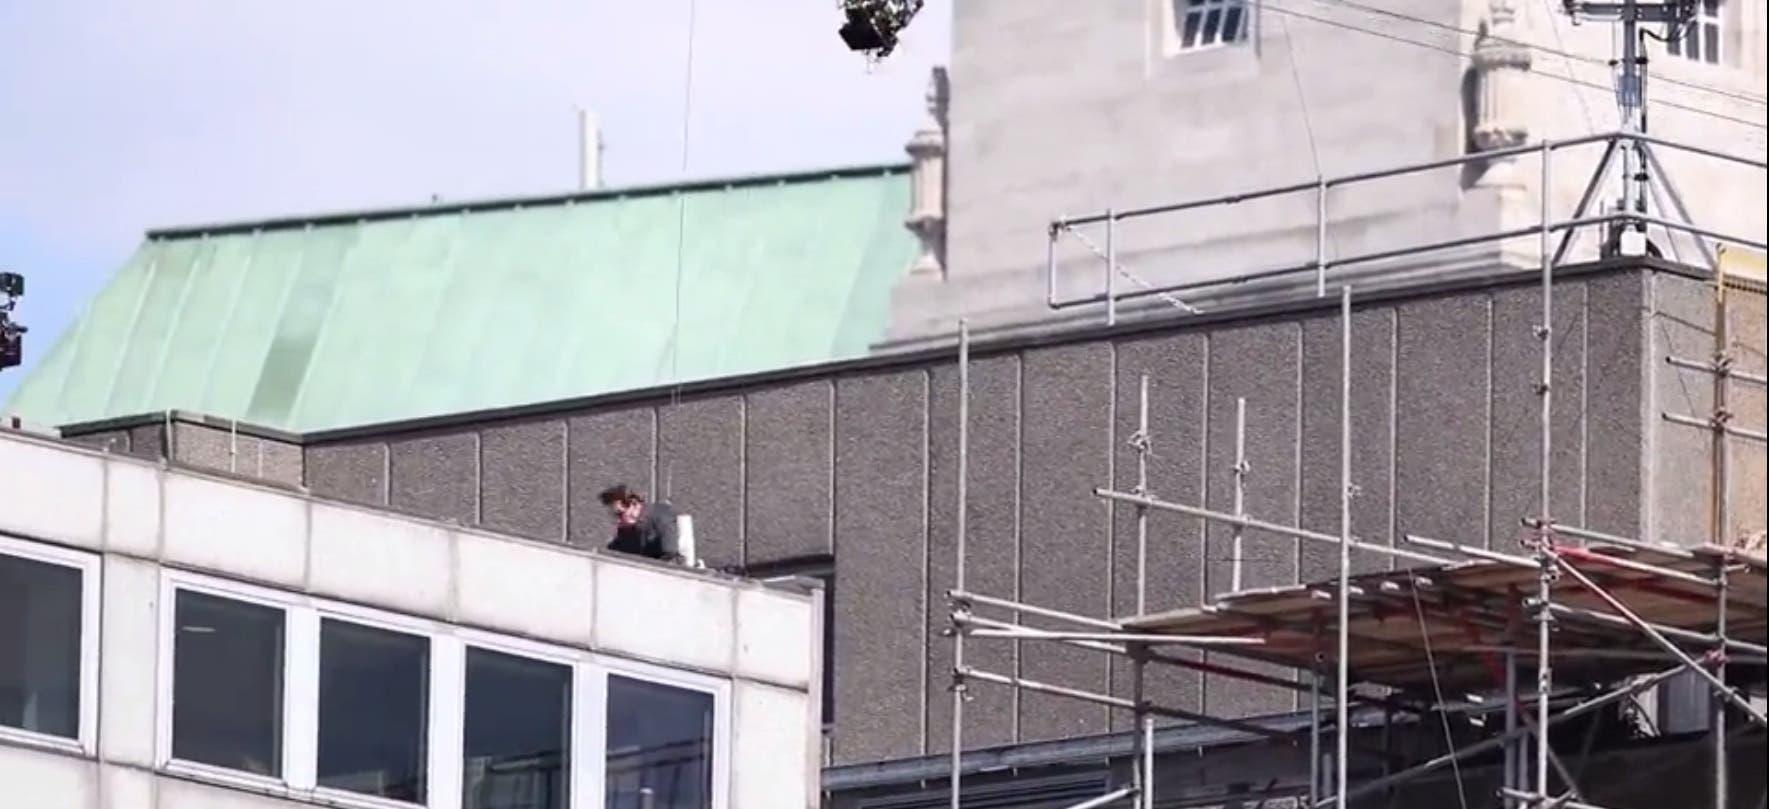 Tom cruise slams into building impact (screengrab)